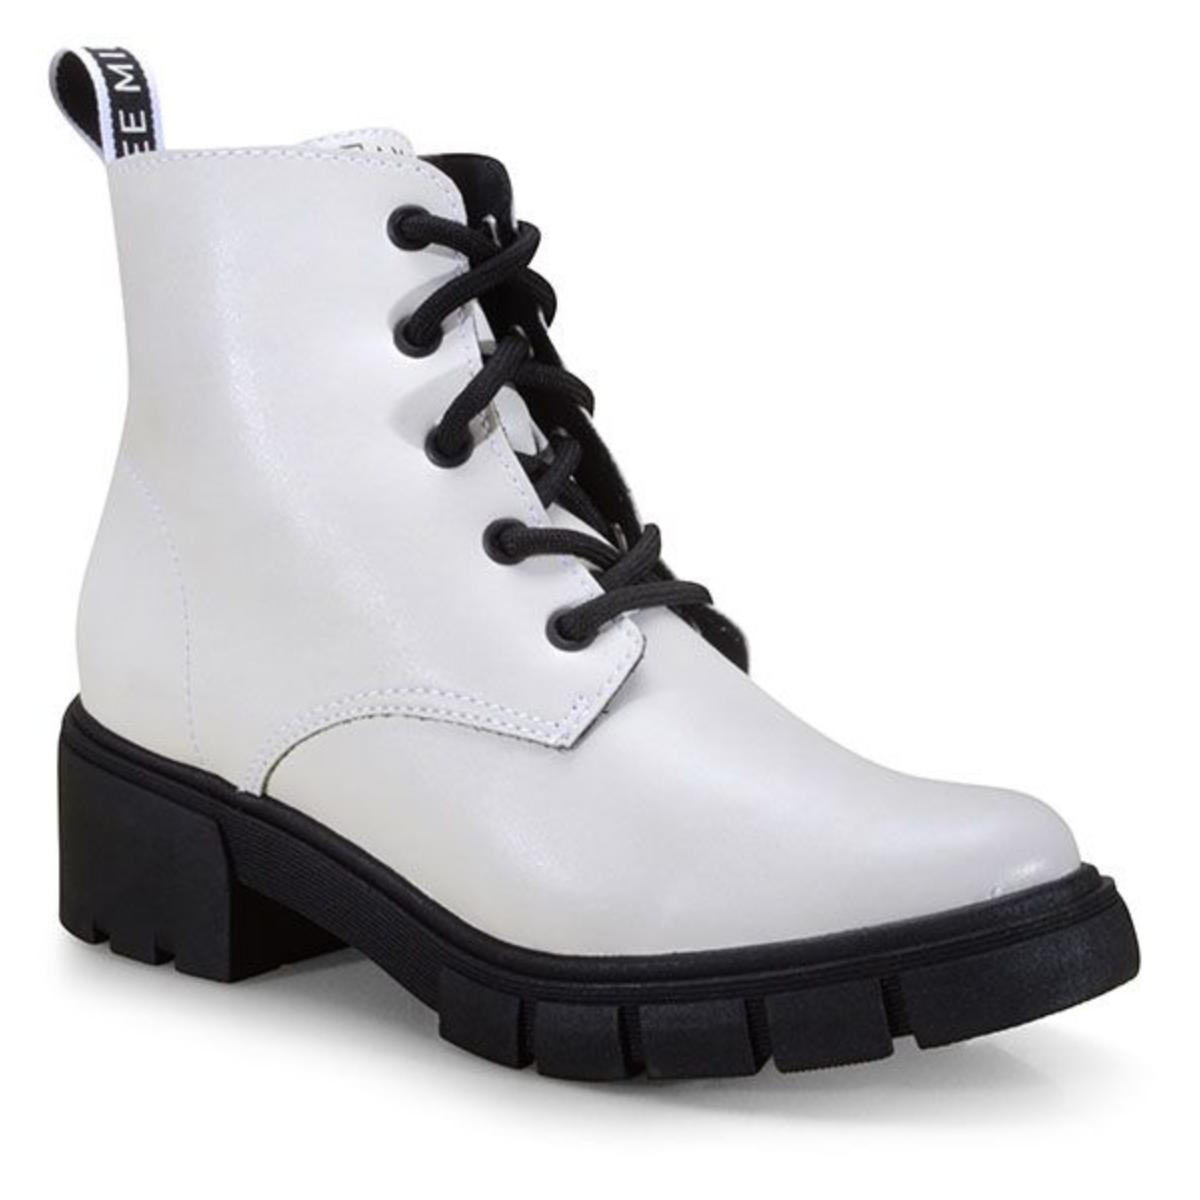 Bota Feminina Ramarim 21-12101 Branco/preto